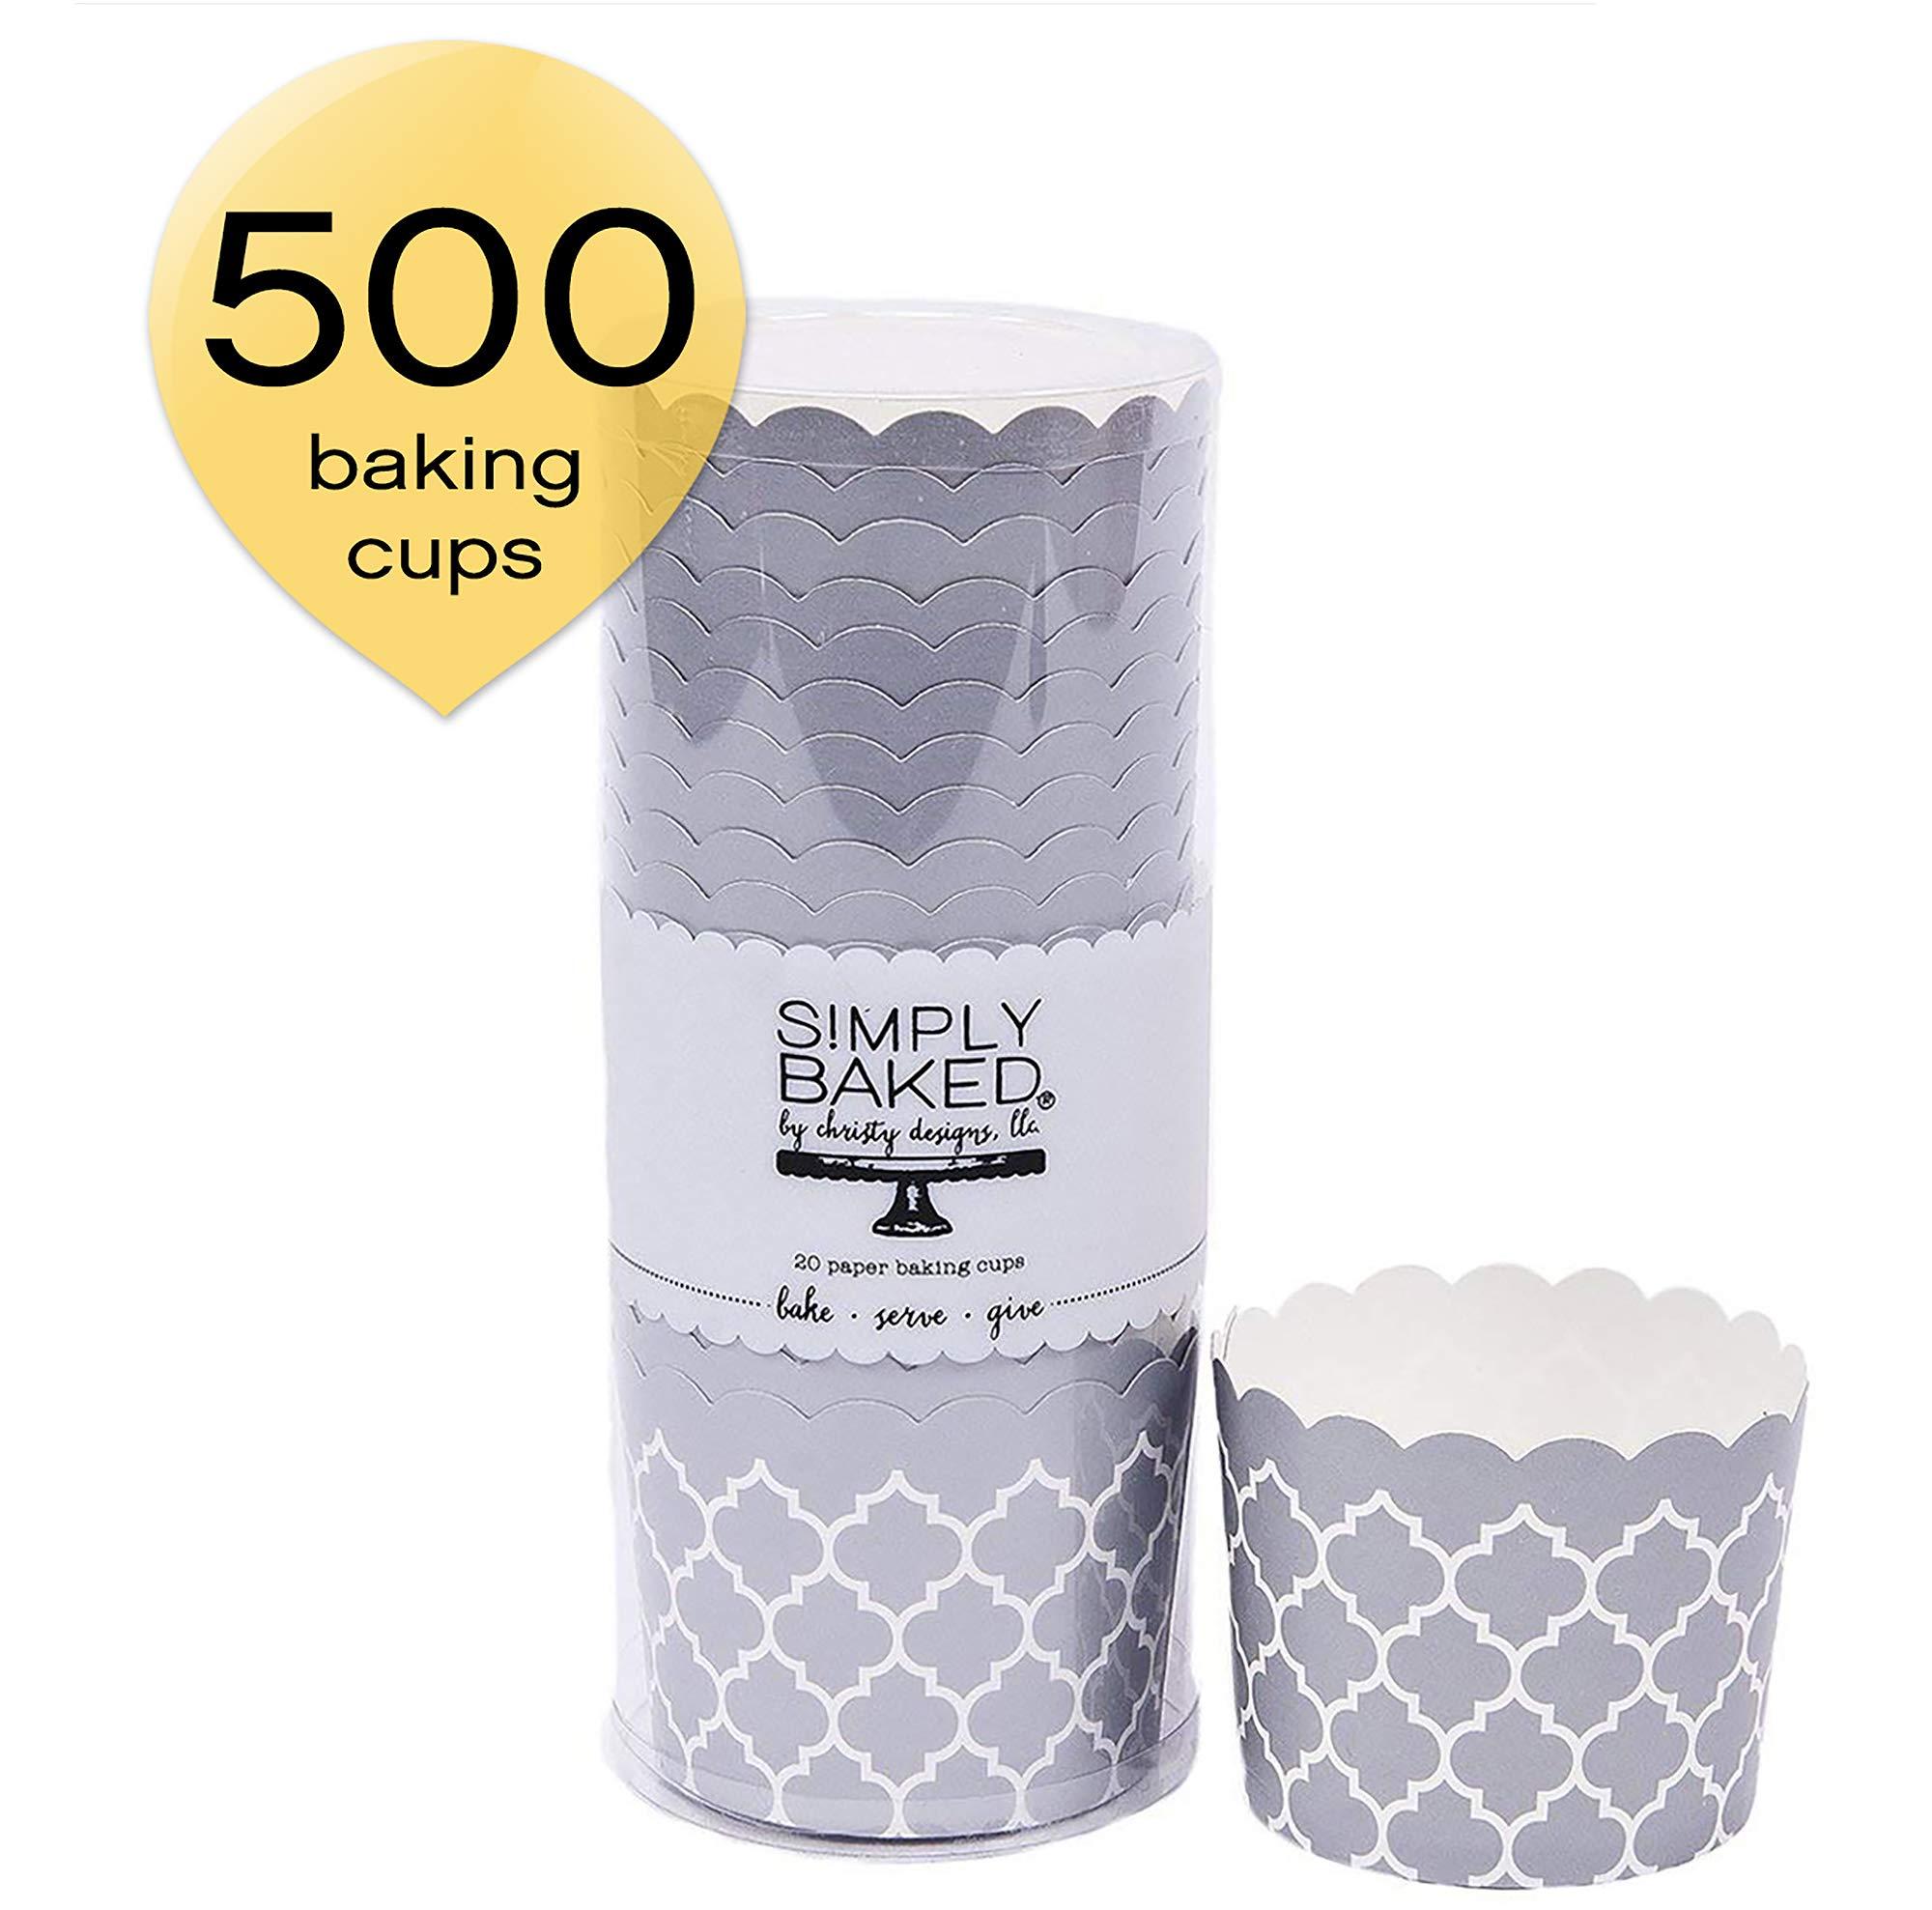 Simply Baked CLG-113-C Metallic Quadrfoil Large Paper Baking Cup, 500-Pack, Silver Quadrafoil